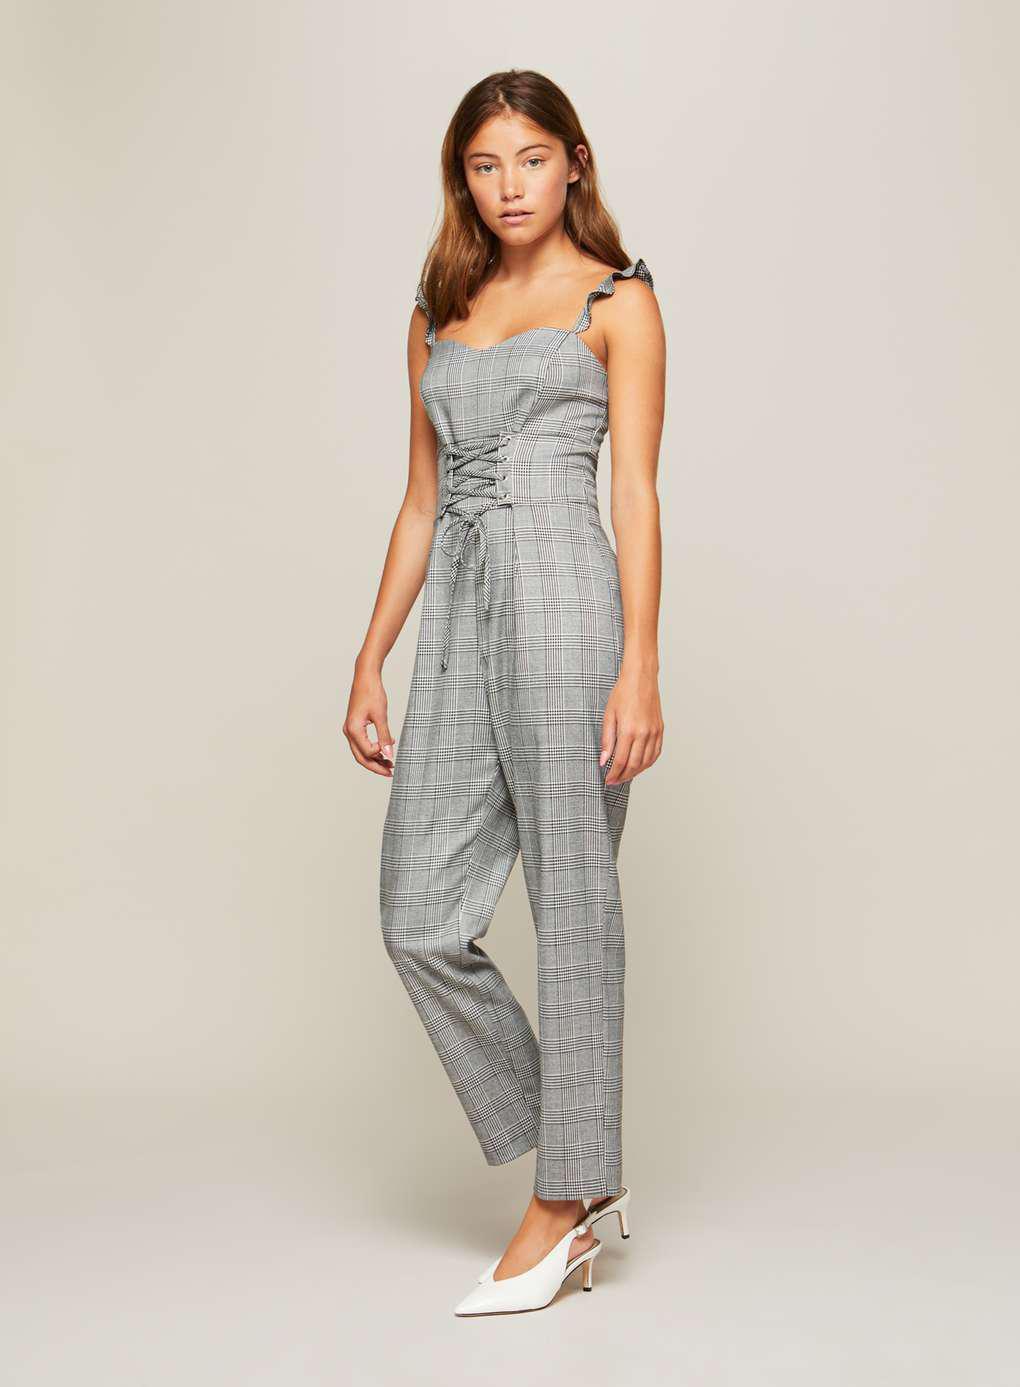 bd5a915c95 Lyst - Miss Selfridge Check Corset Jumpsuit in Gray